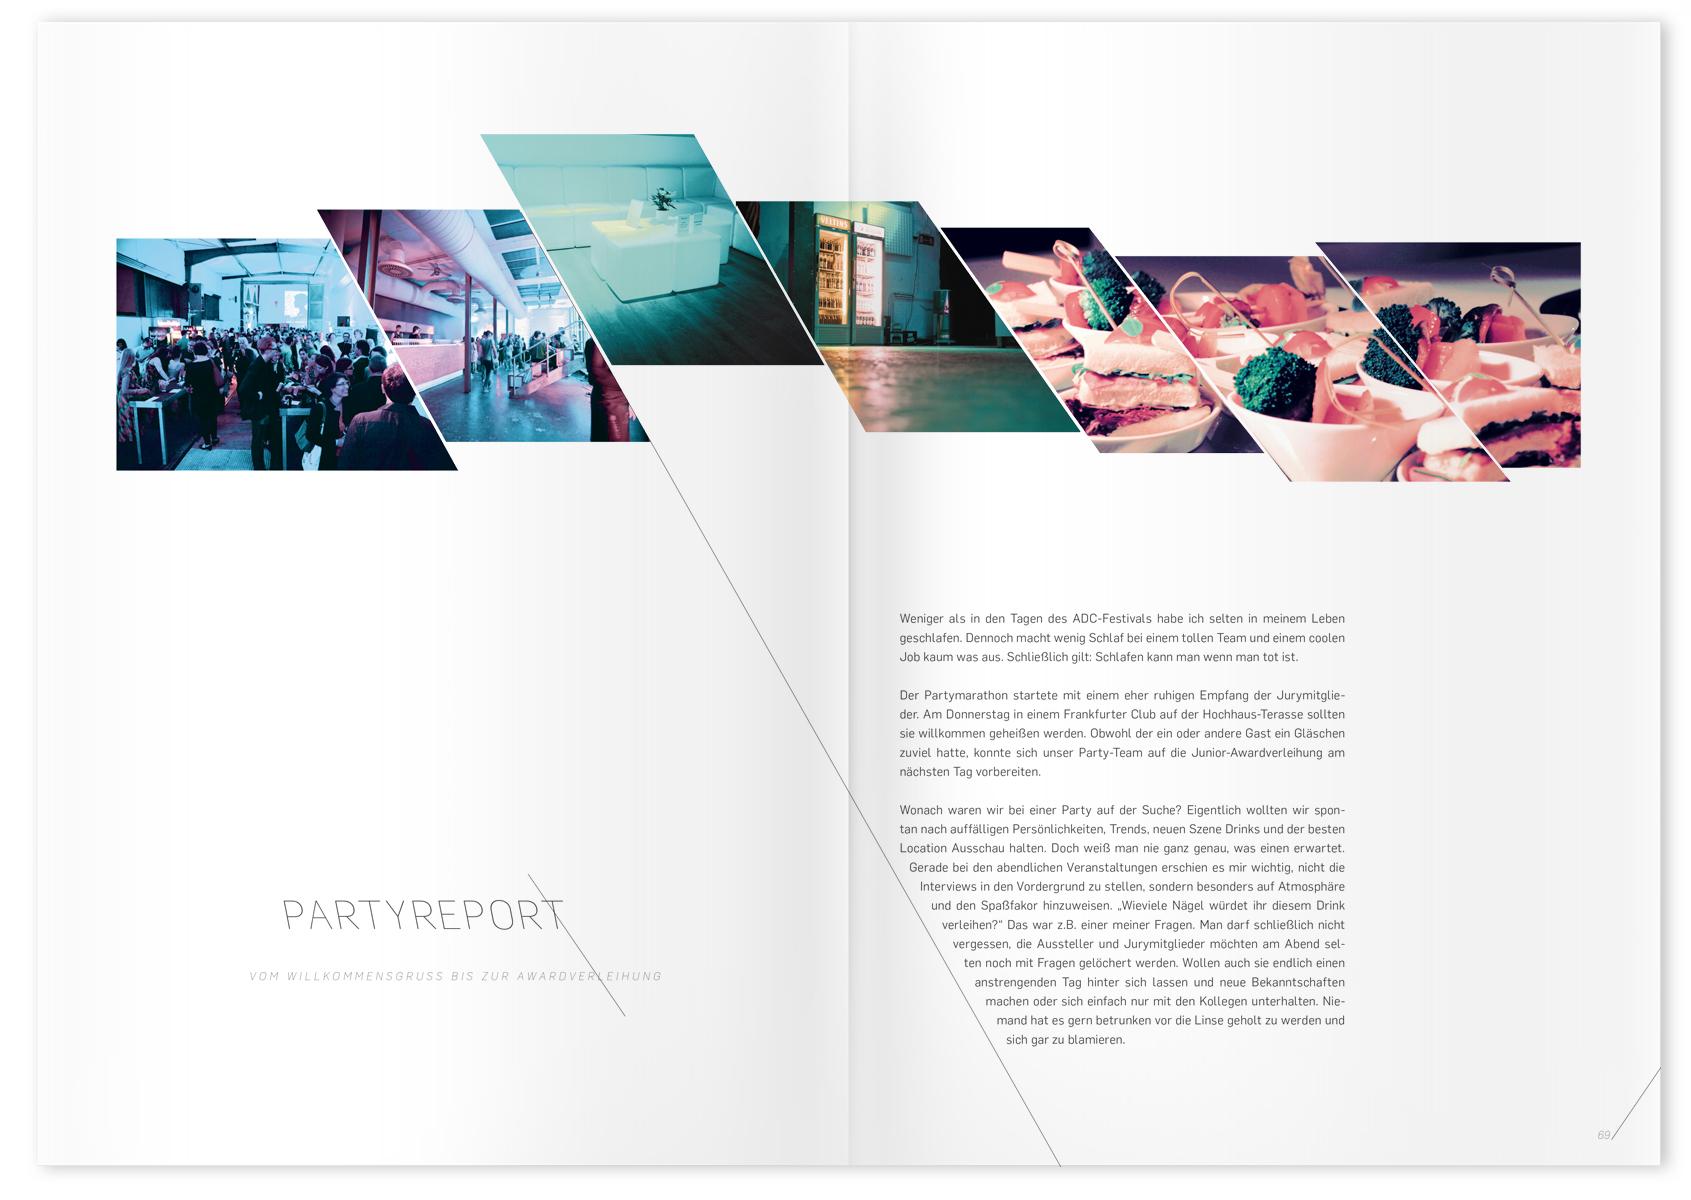 01_hFMA Netzreporter_ADC Festival_Editorial Design_Grafikdesign_Gloria Kison.jpg